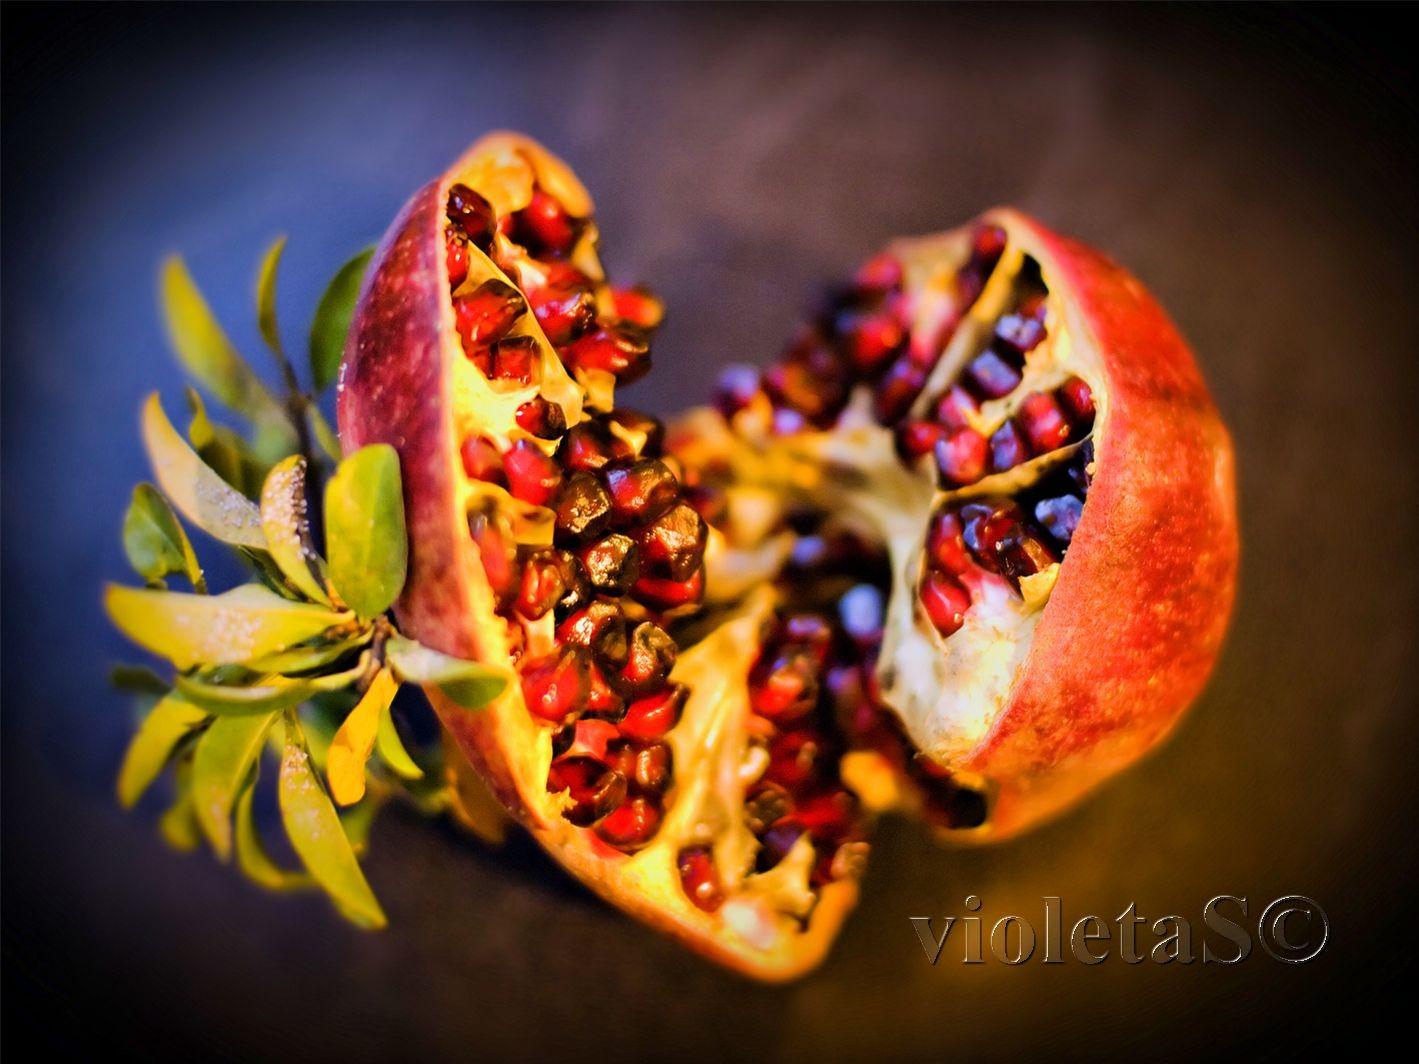 #Pomegranate #euphoriaphotography